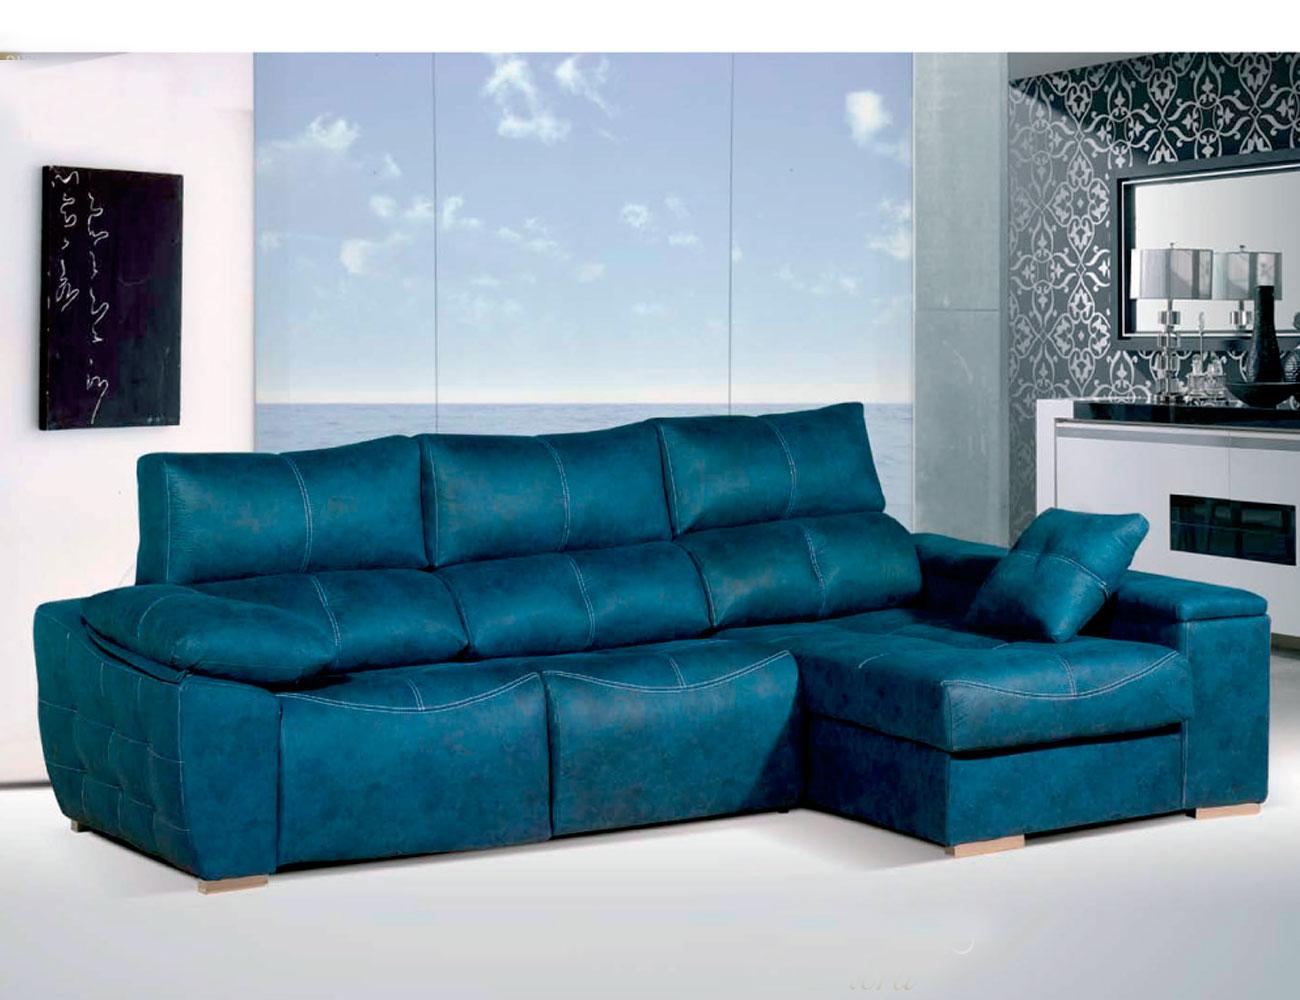 Sofa chaiselongue relax 2 motores anti manchas turquesa25